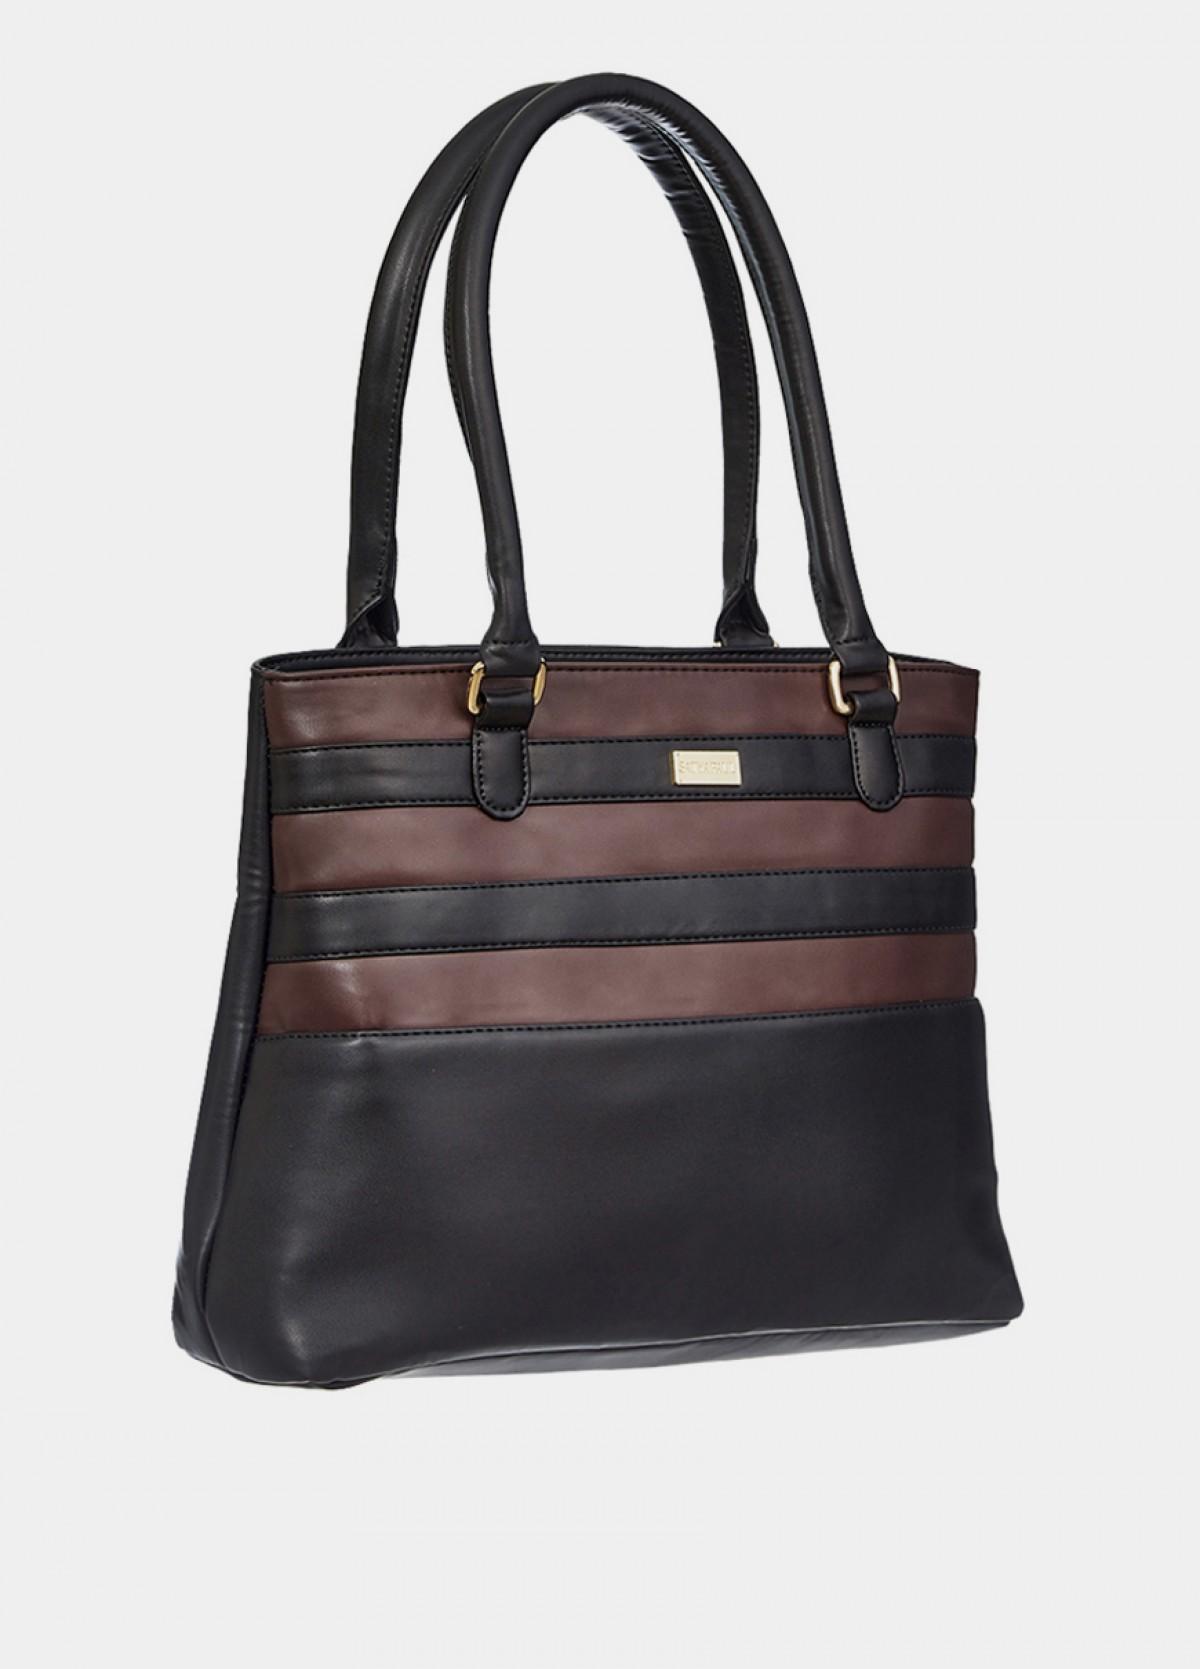 The Classic Handbag